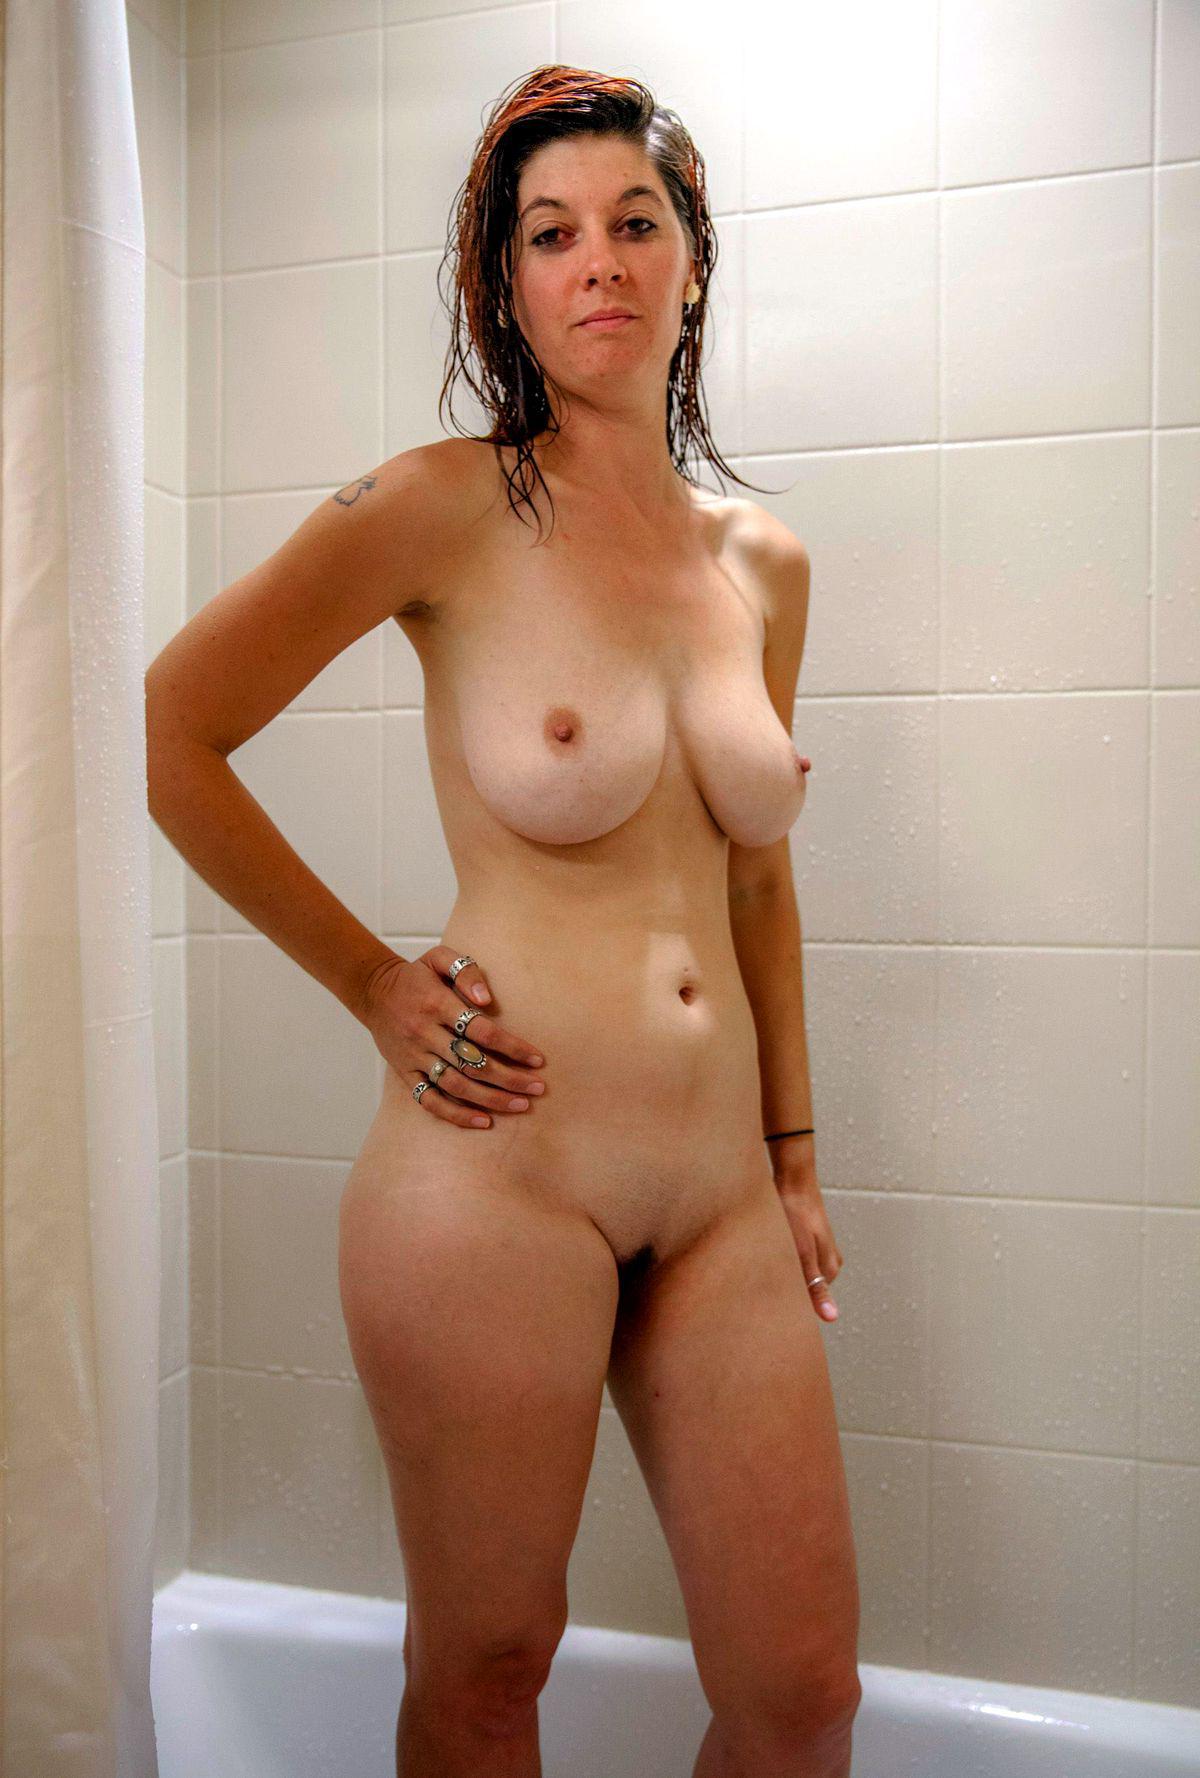 amature pretty nude ladies pics